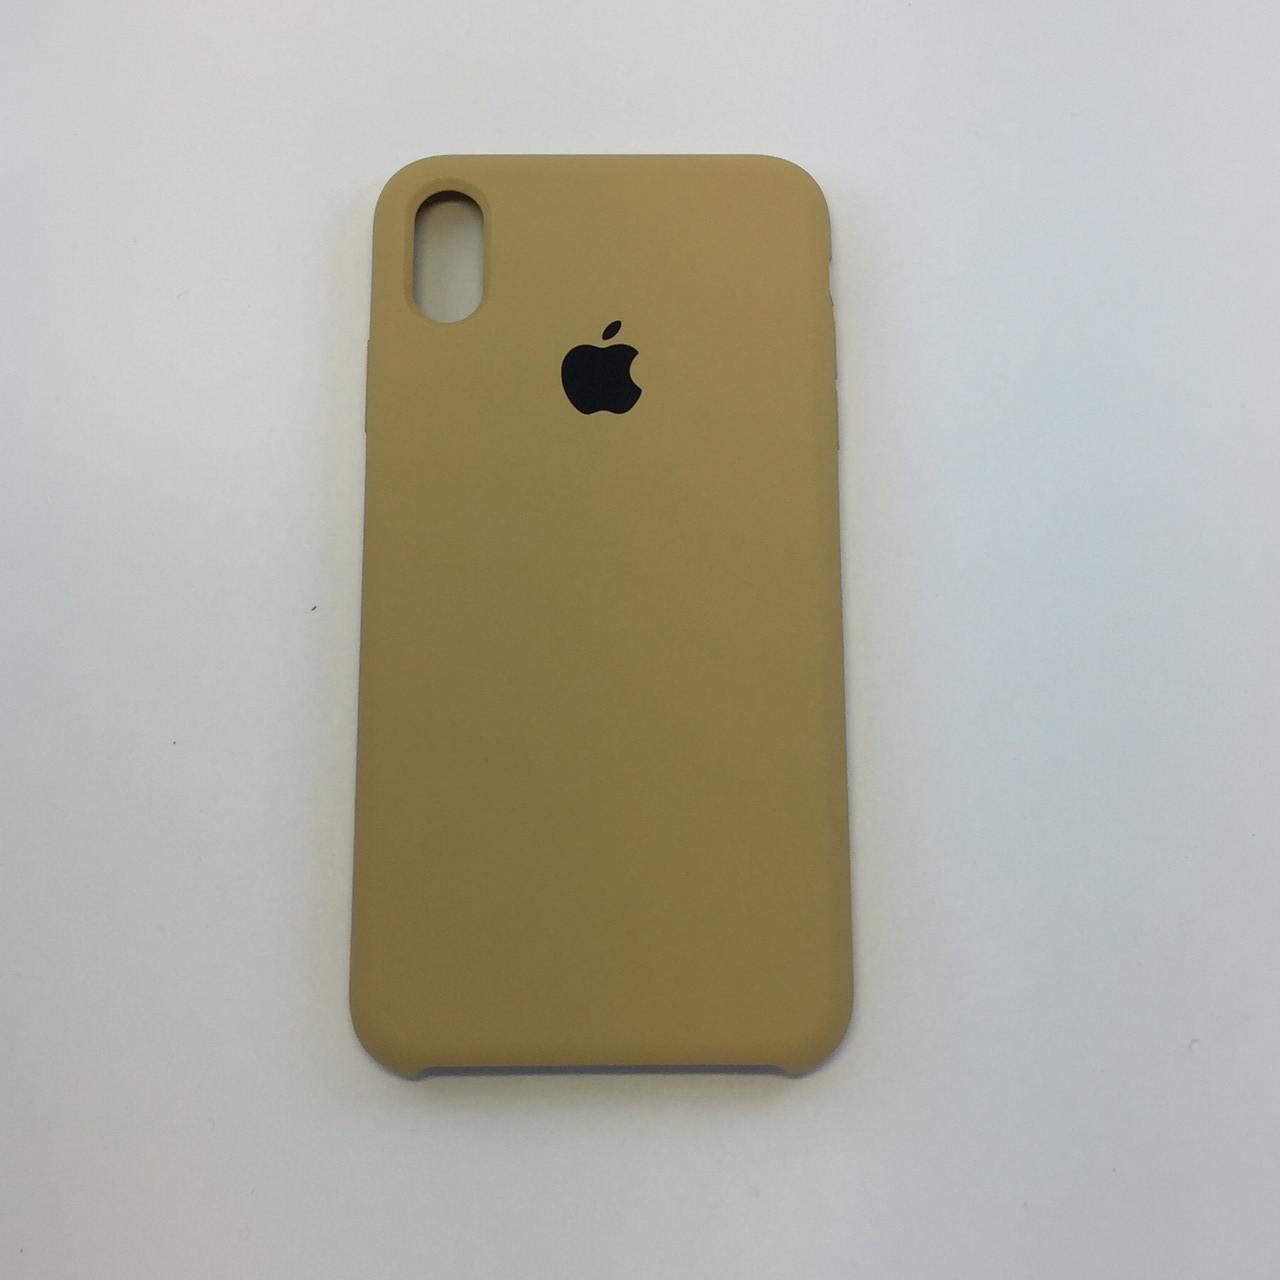 "Чехол - Silicon Case для iPhone ""Gold - №28"" - copy orig."